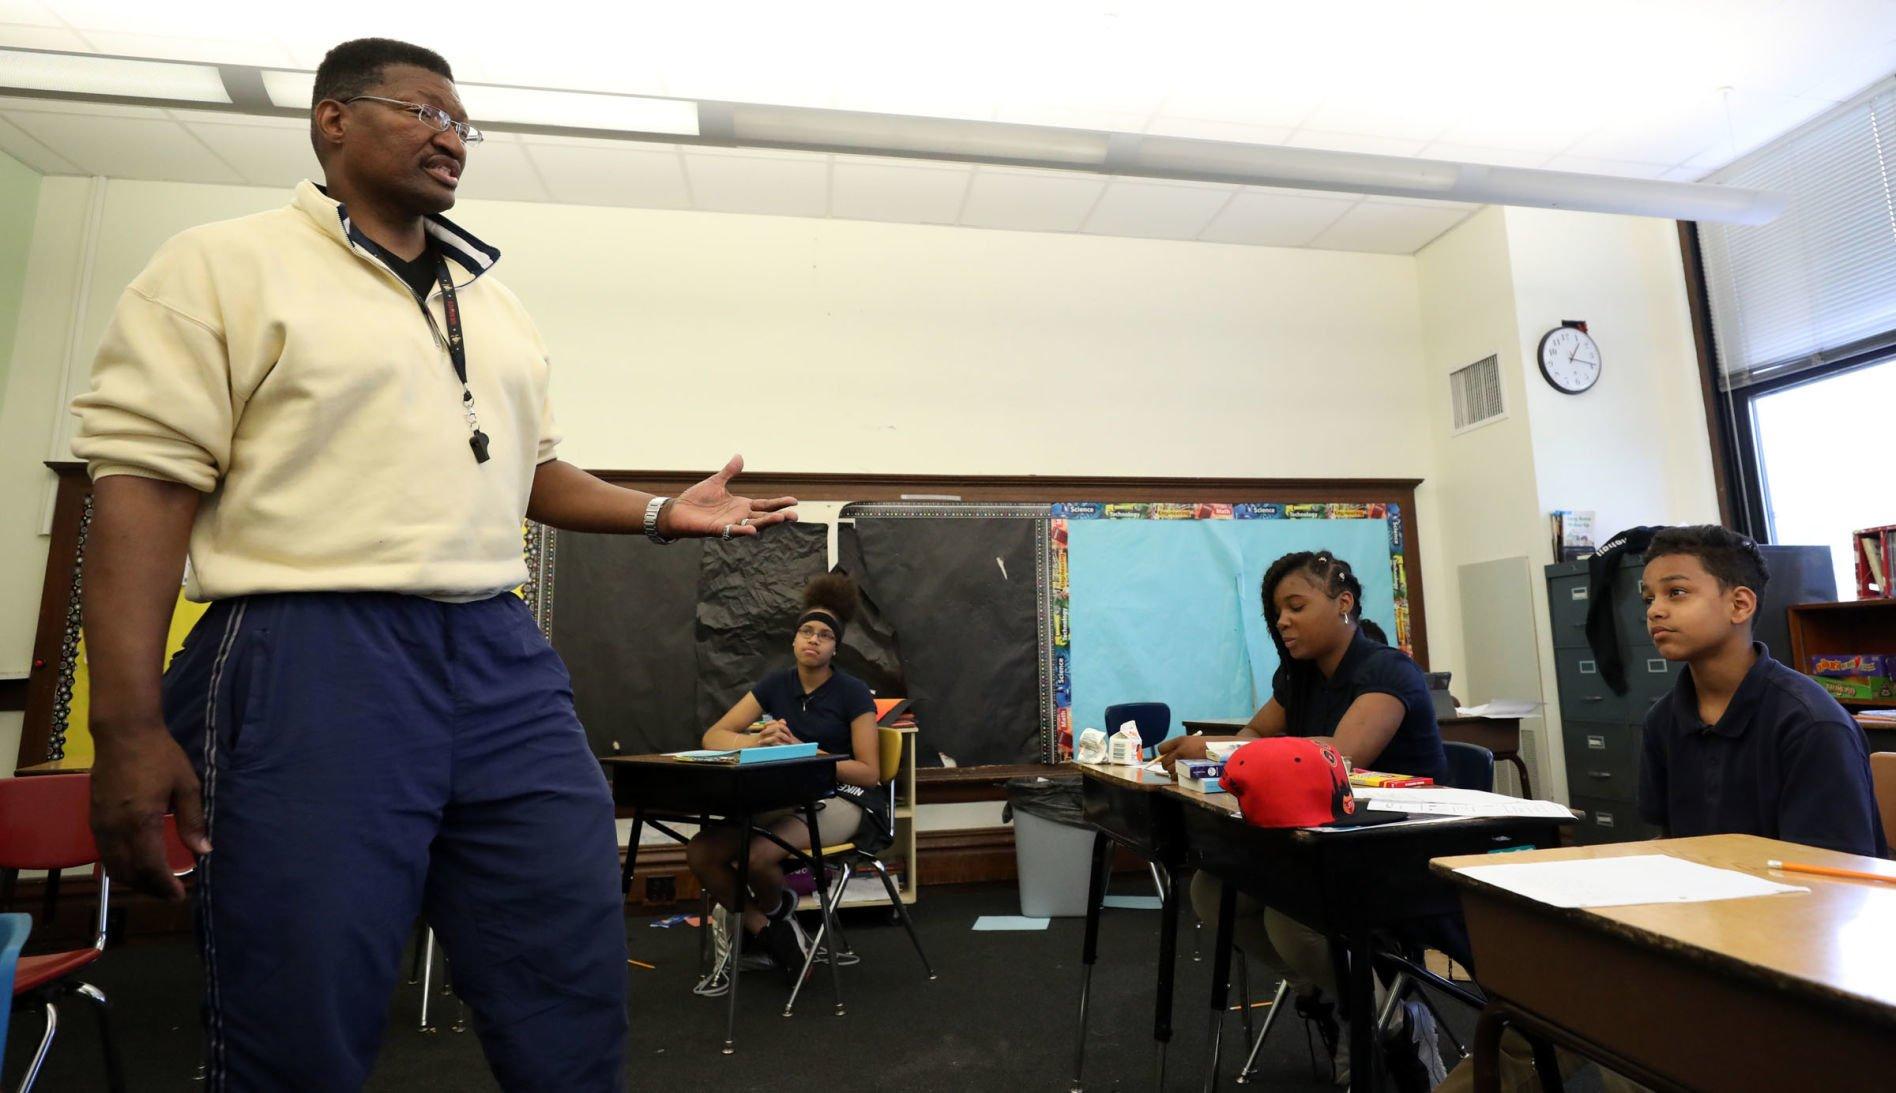 school district runs background check on teacher racism